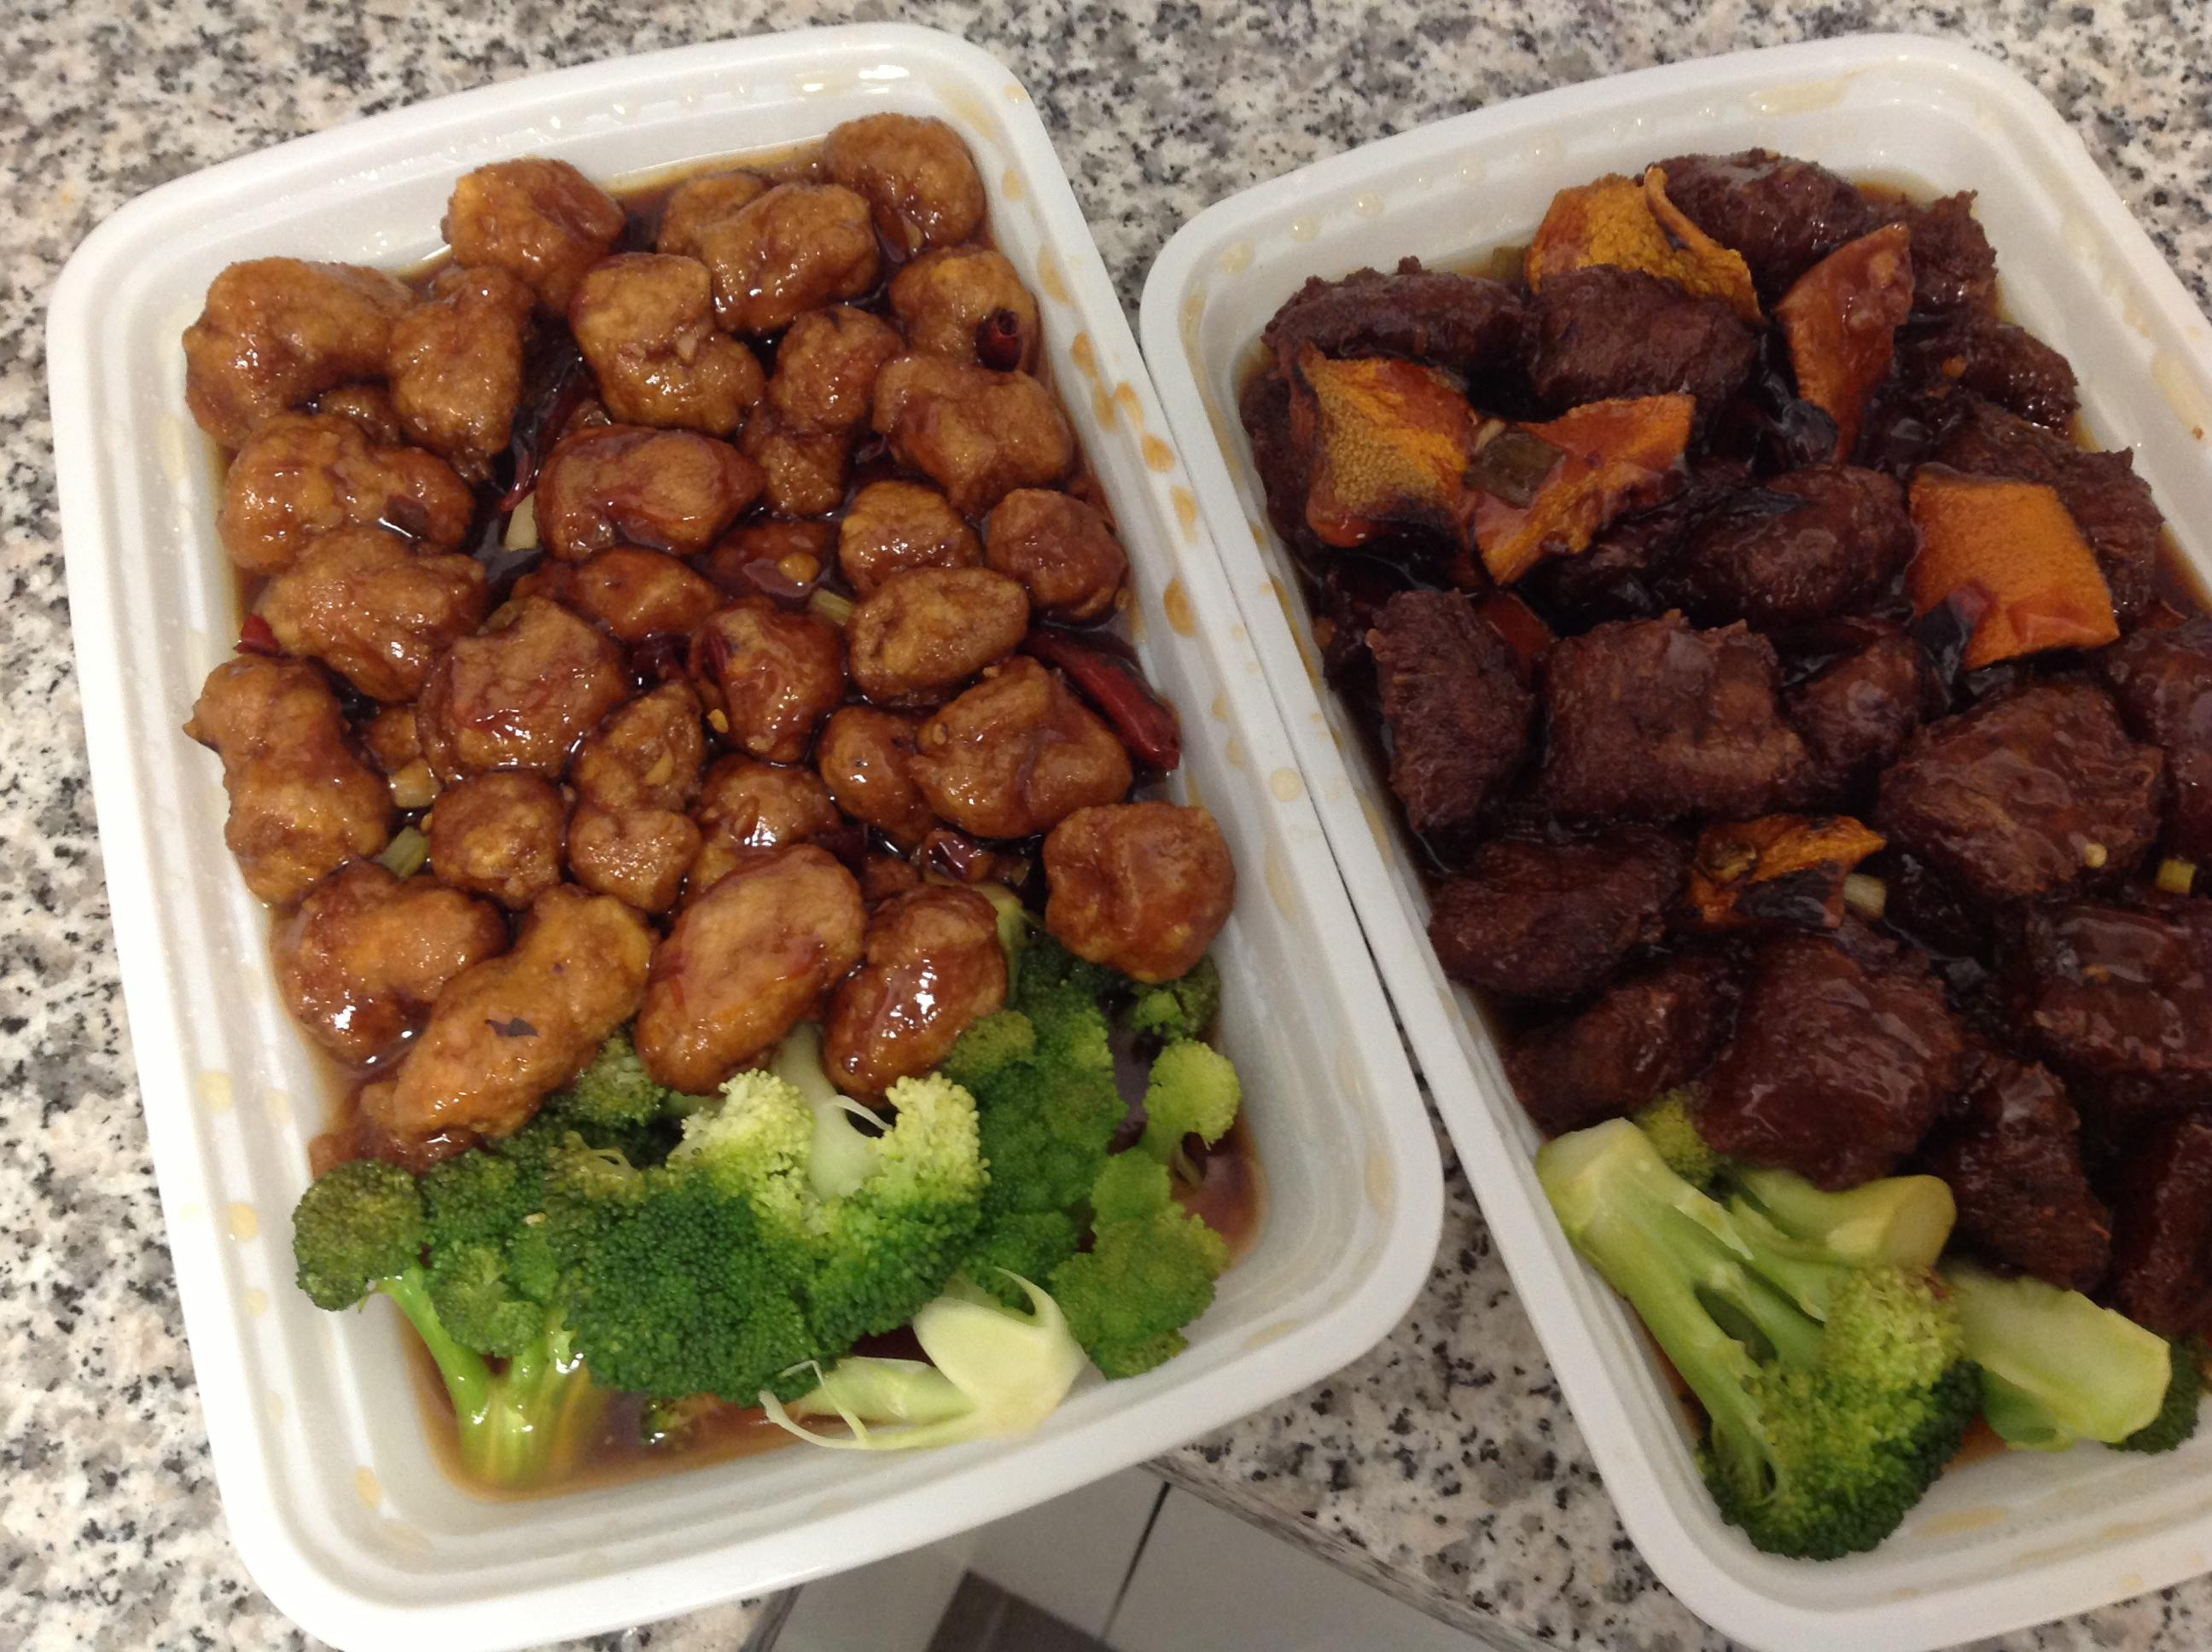 Takeout - General Tsao's Chicken, Orange Beef